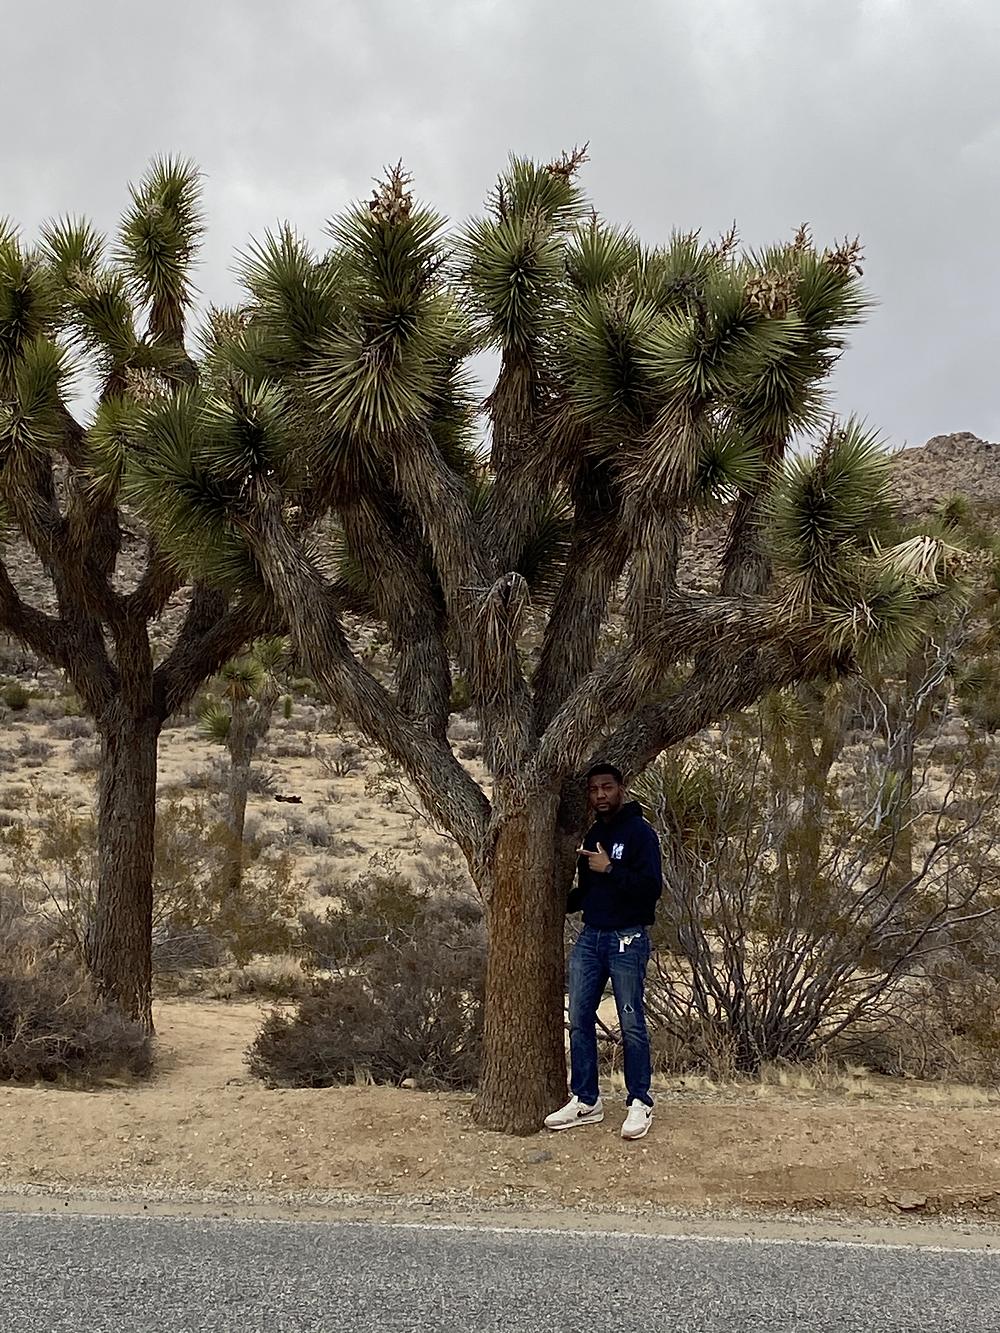 The Novaturient Nomad hugging a Joshua Tree